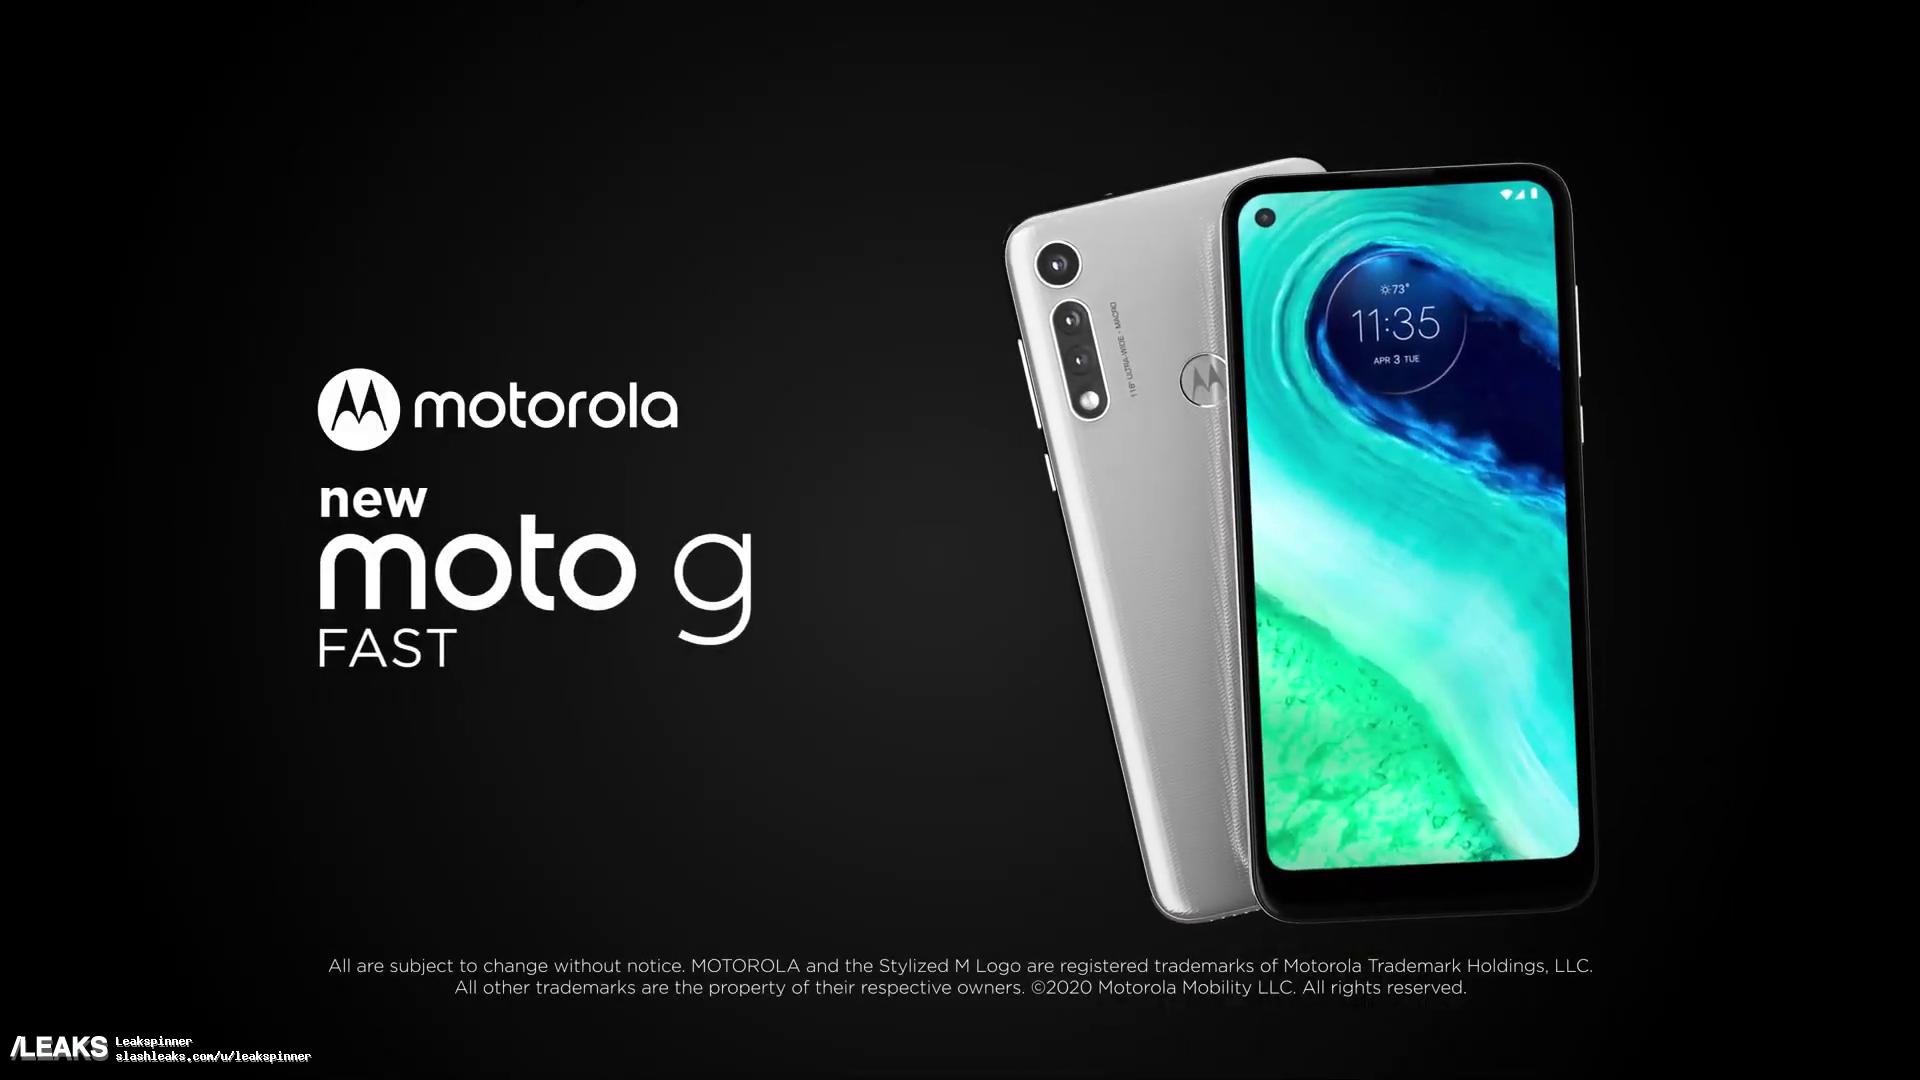 img Motorola Moto G Fast promo video leaks out